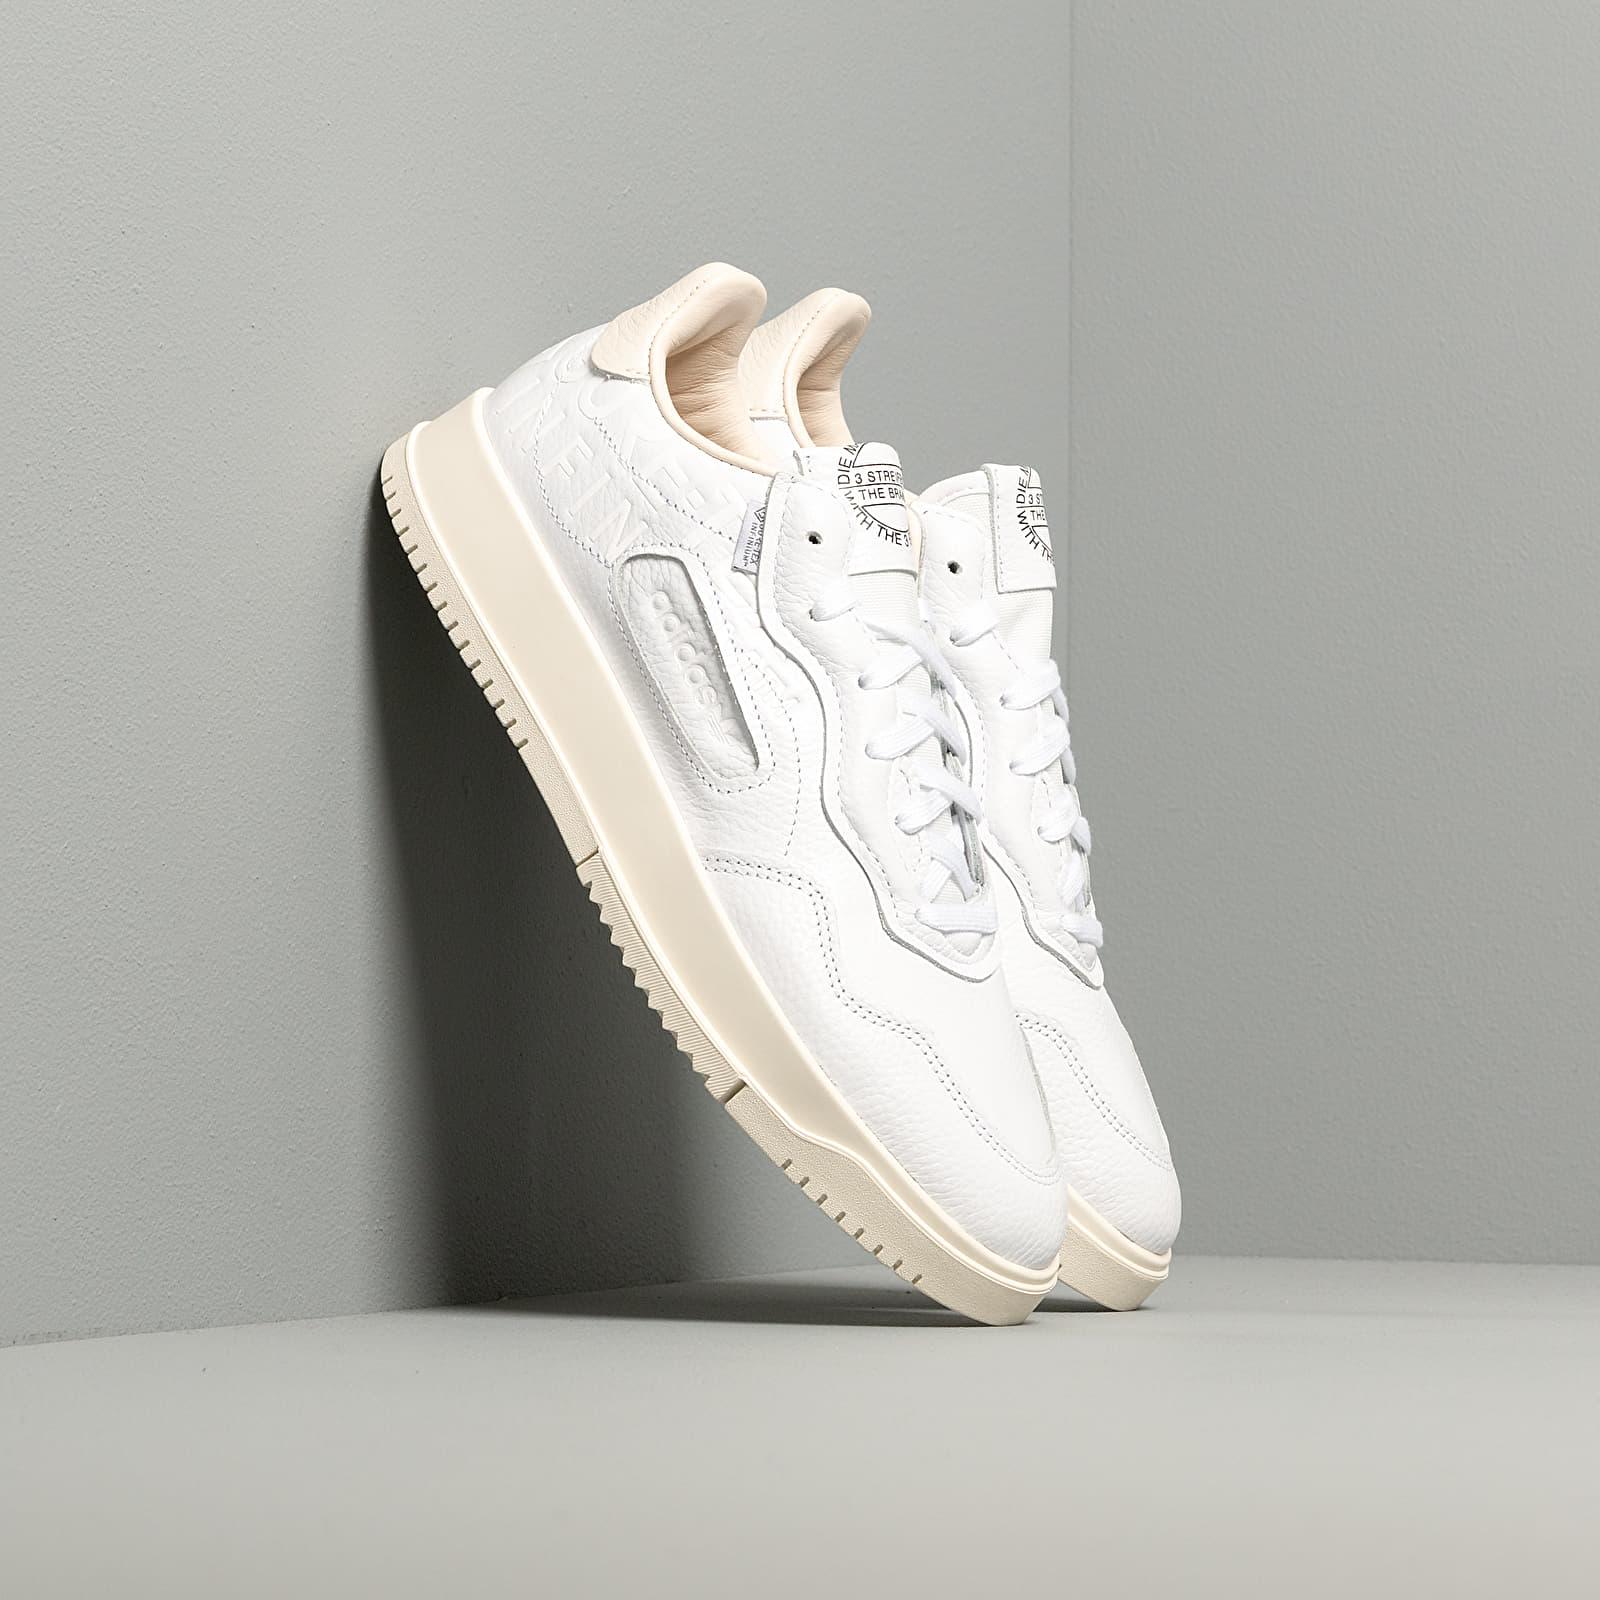 Satisfacer Retirada Mártir  Men's shoes adidas SC Premiere Gore-Tex Ftwr White/ Off White/ Chalk White  | Footshop